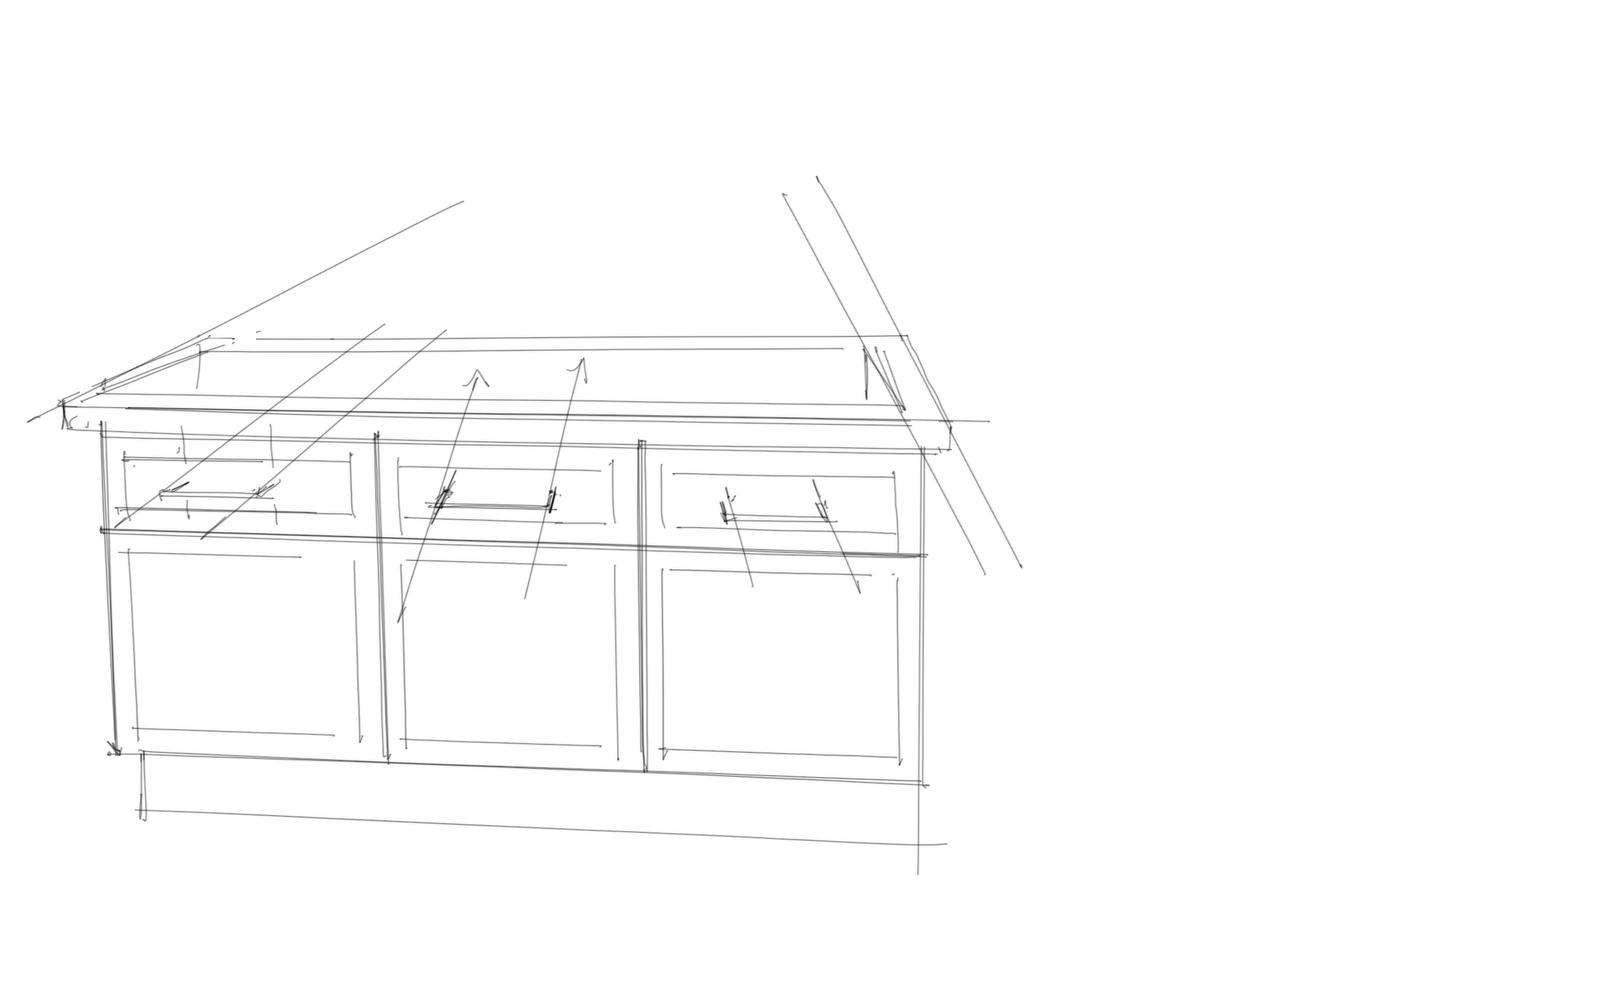 Interior Design Rendering: Understanding Details On A Bathroom Cabinet